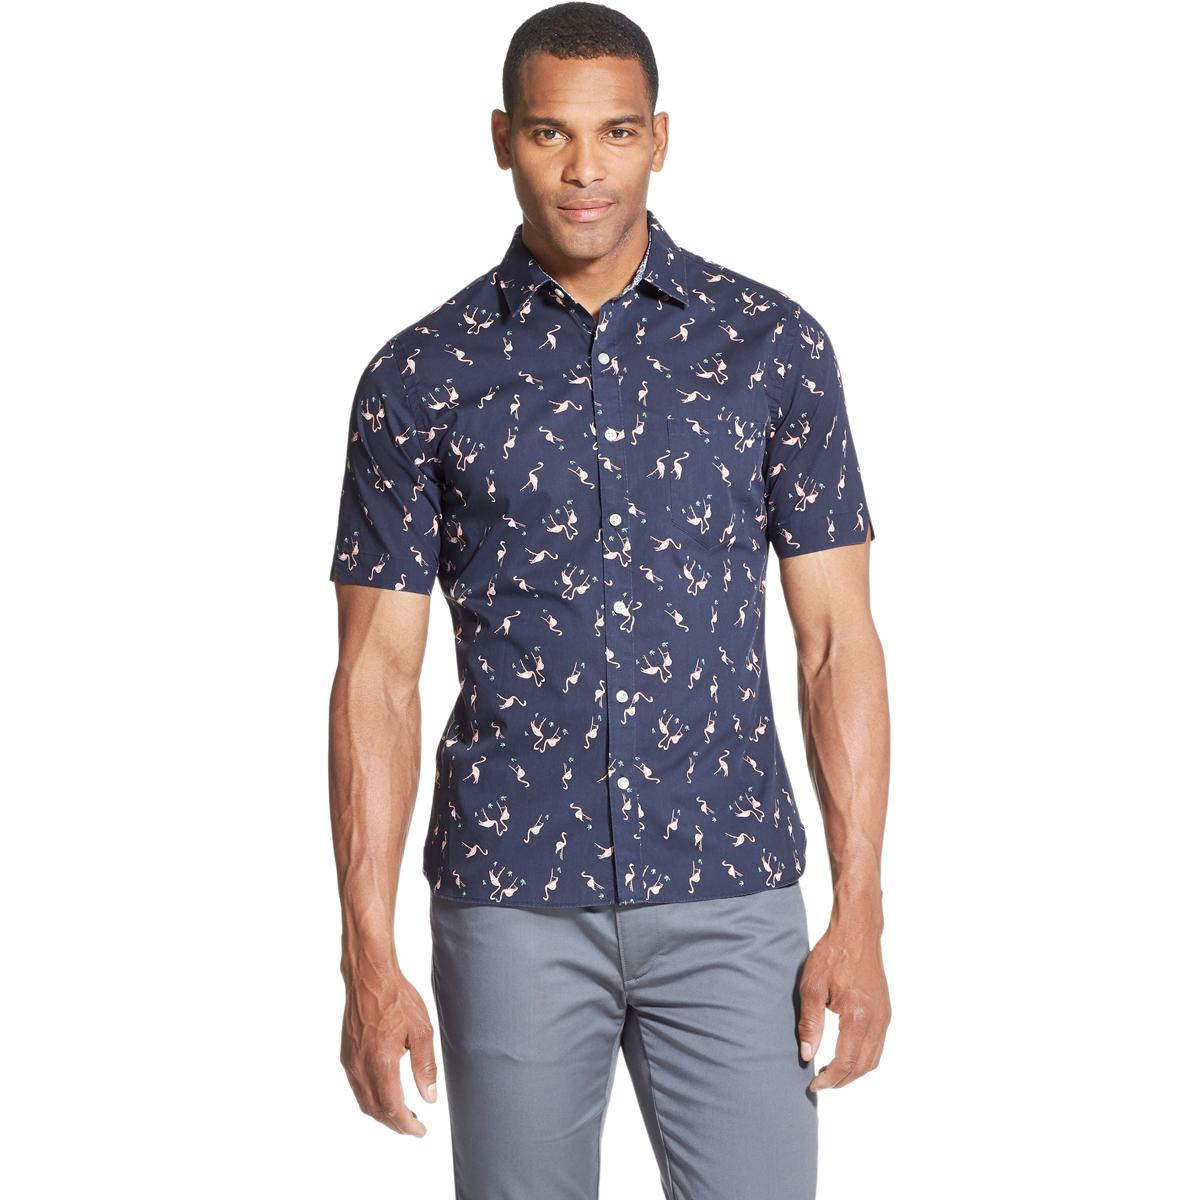 Van Heusen Men's Never Tuck Slim Fit Short-Sleeve Shirt - Blue, L